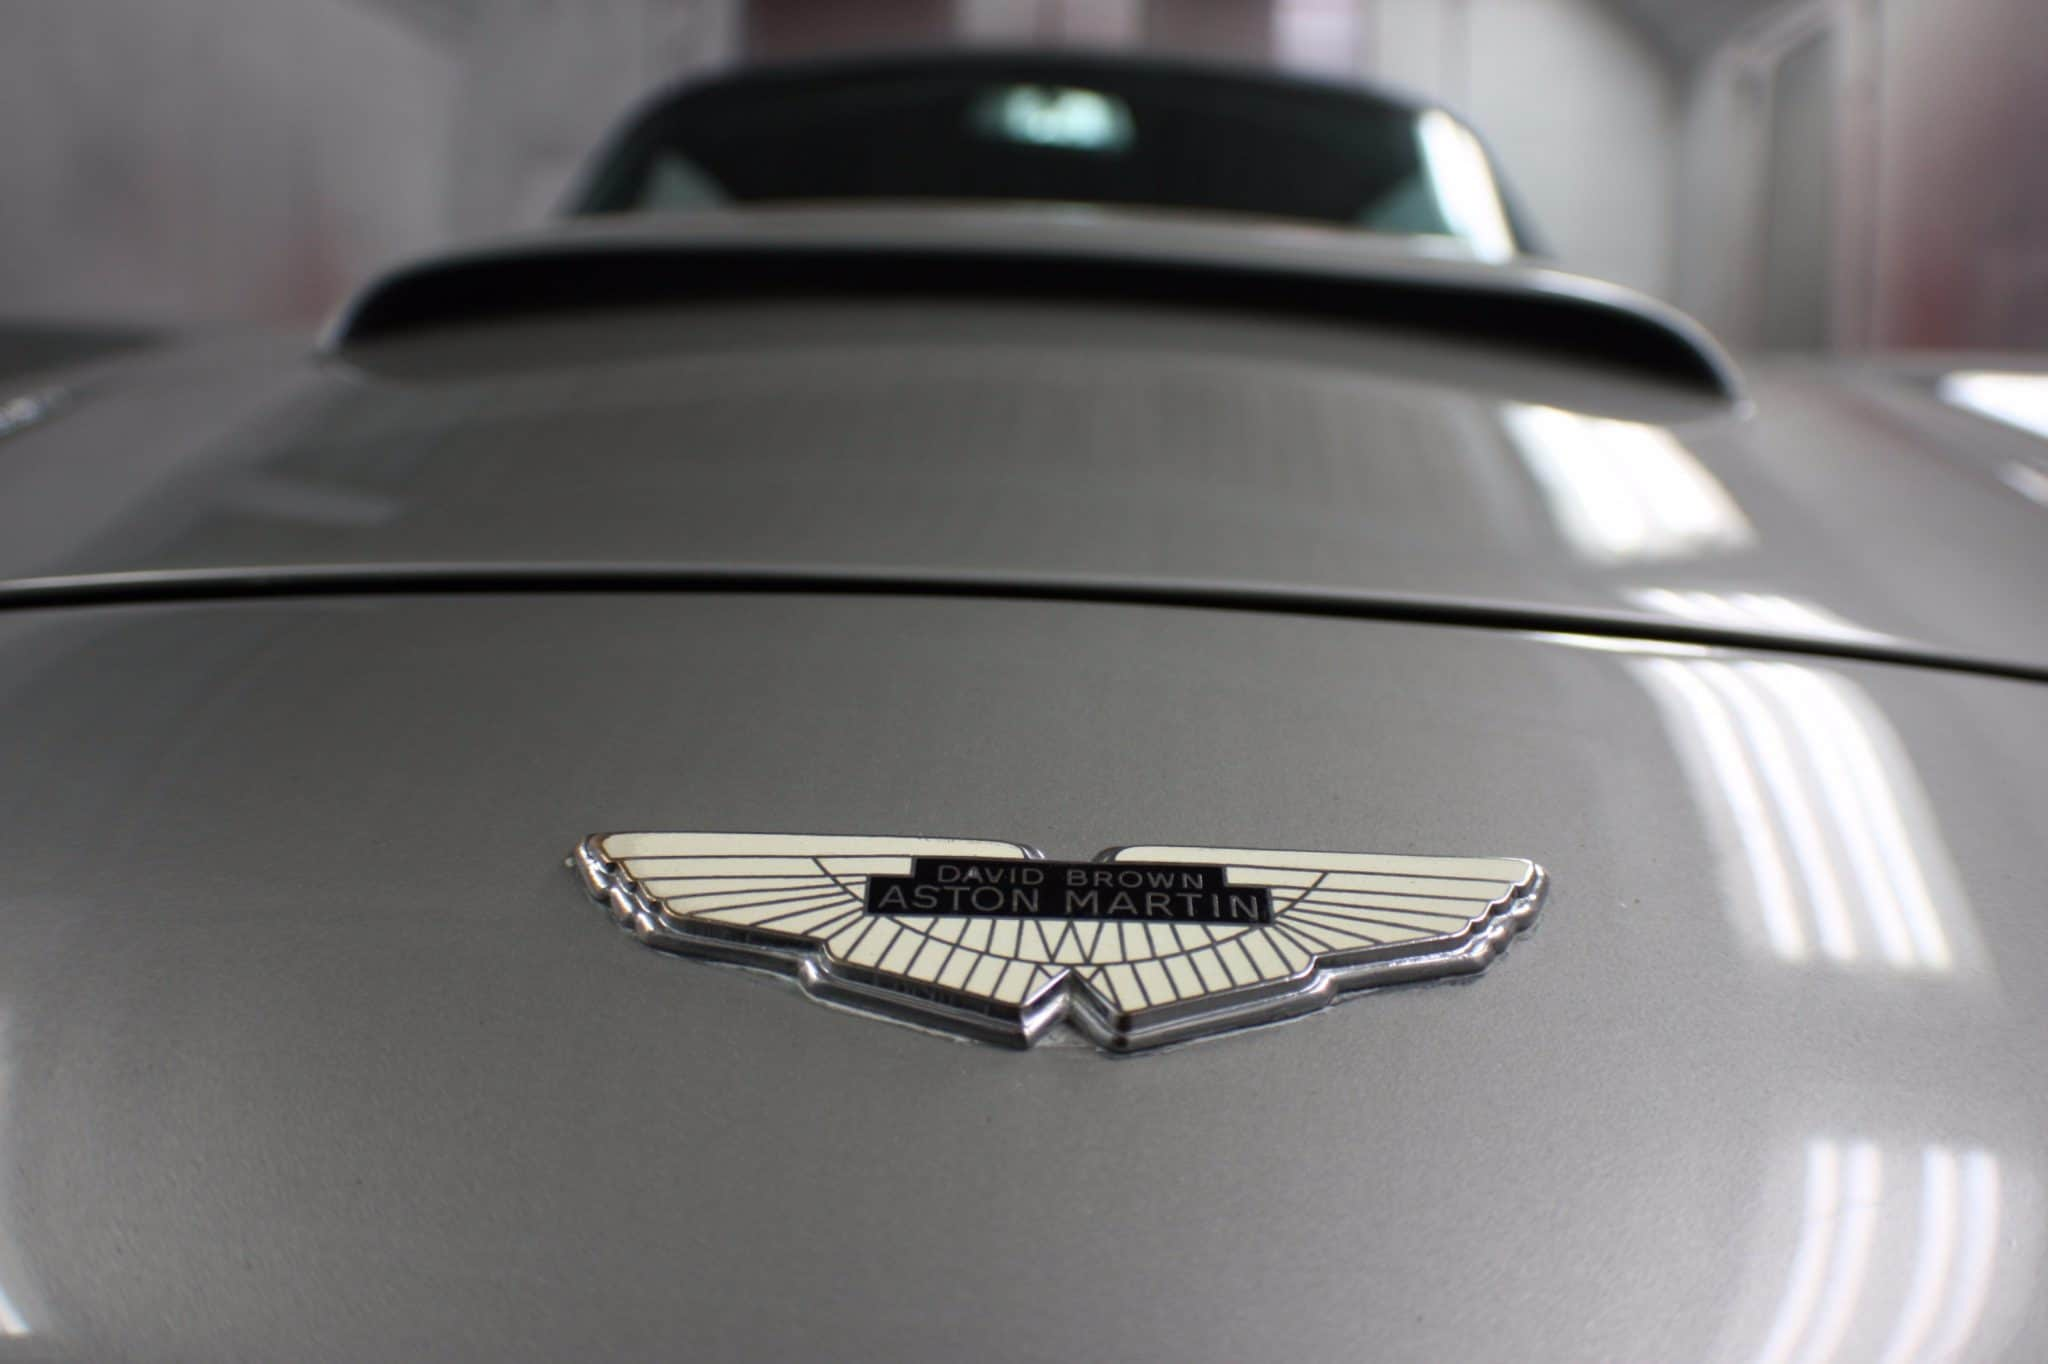 close up of Aston Martin badge